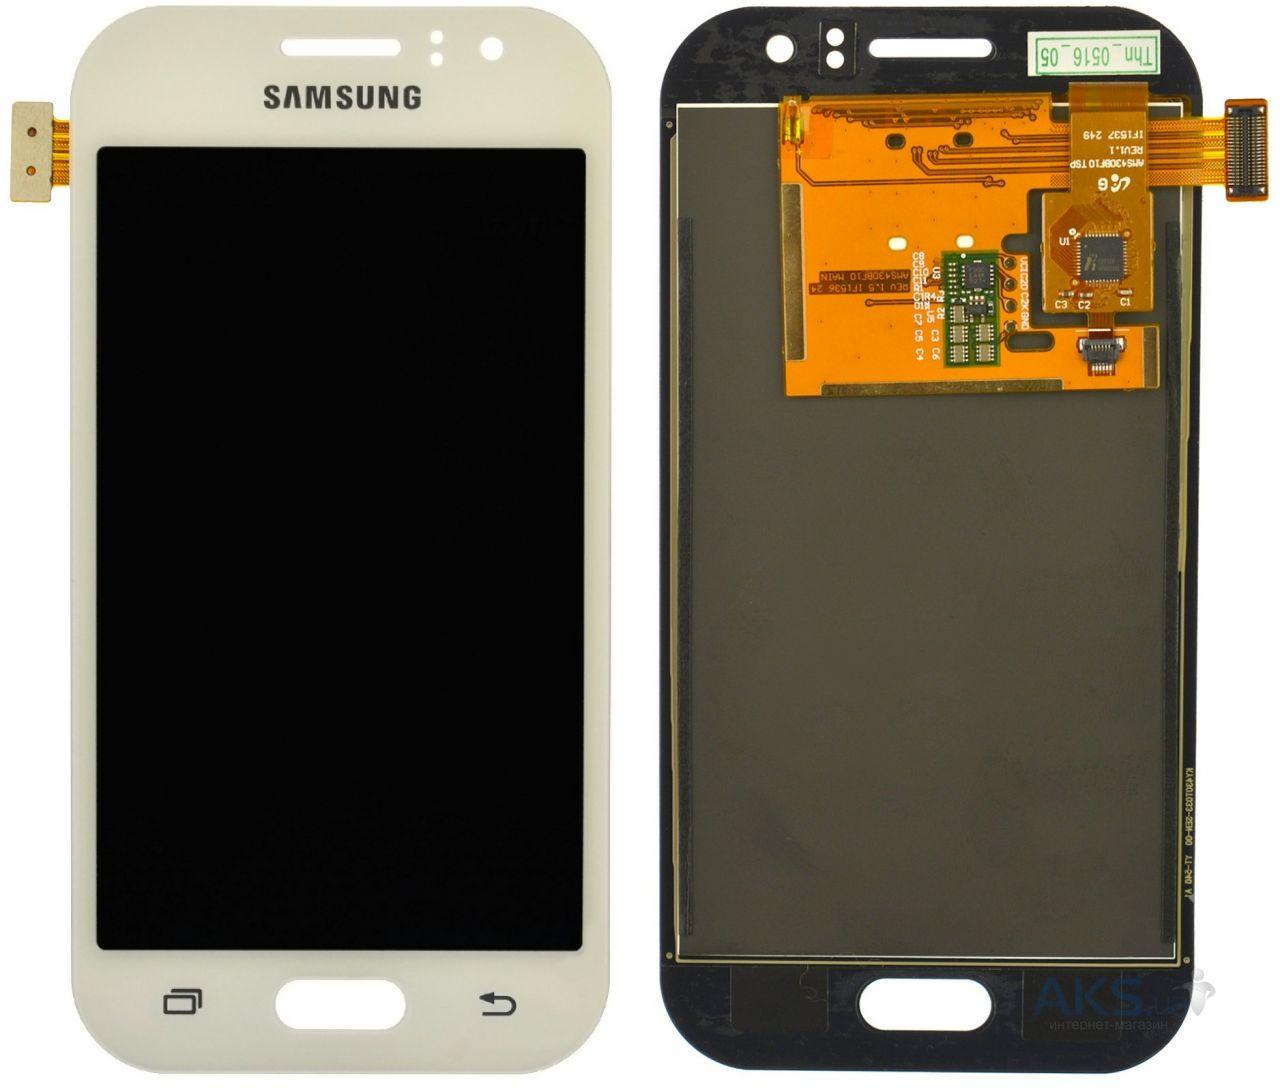 6199534a3cb5b Дисплей (экран) для телефона Samsung Galaxy J1 Ace Duos J110H, Dual Sim,